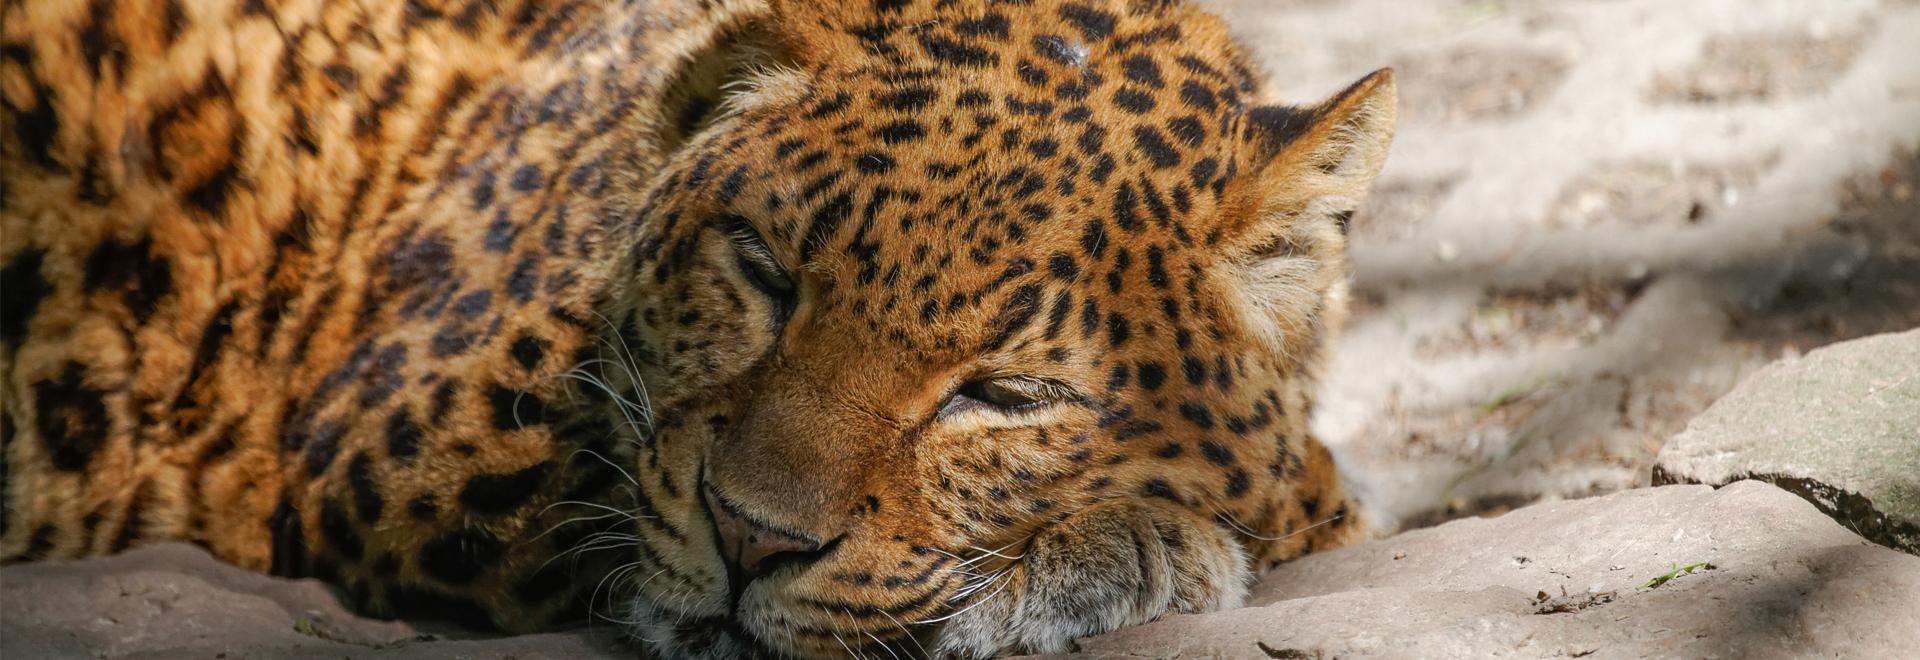 Tierpark Gotha Leopard ©B. Seydel